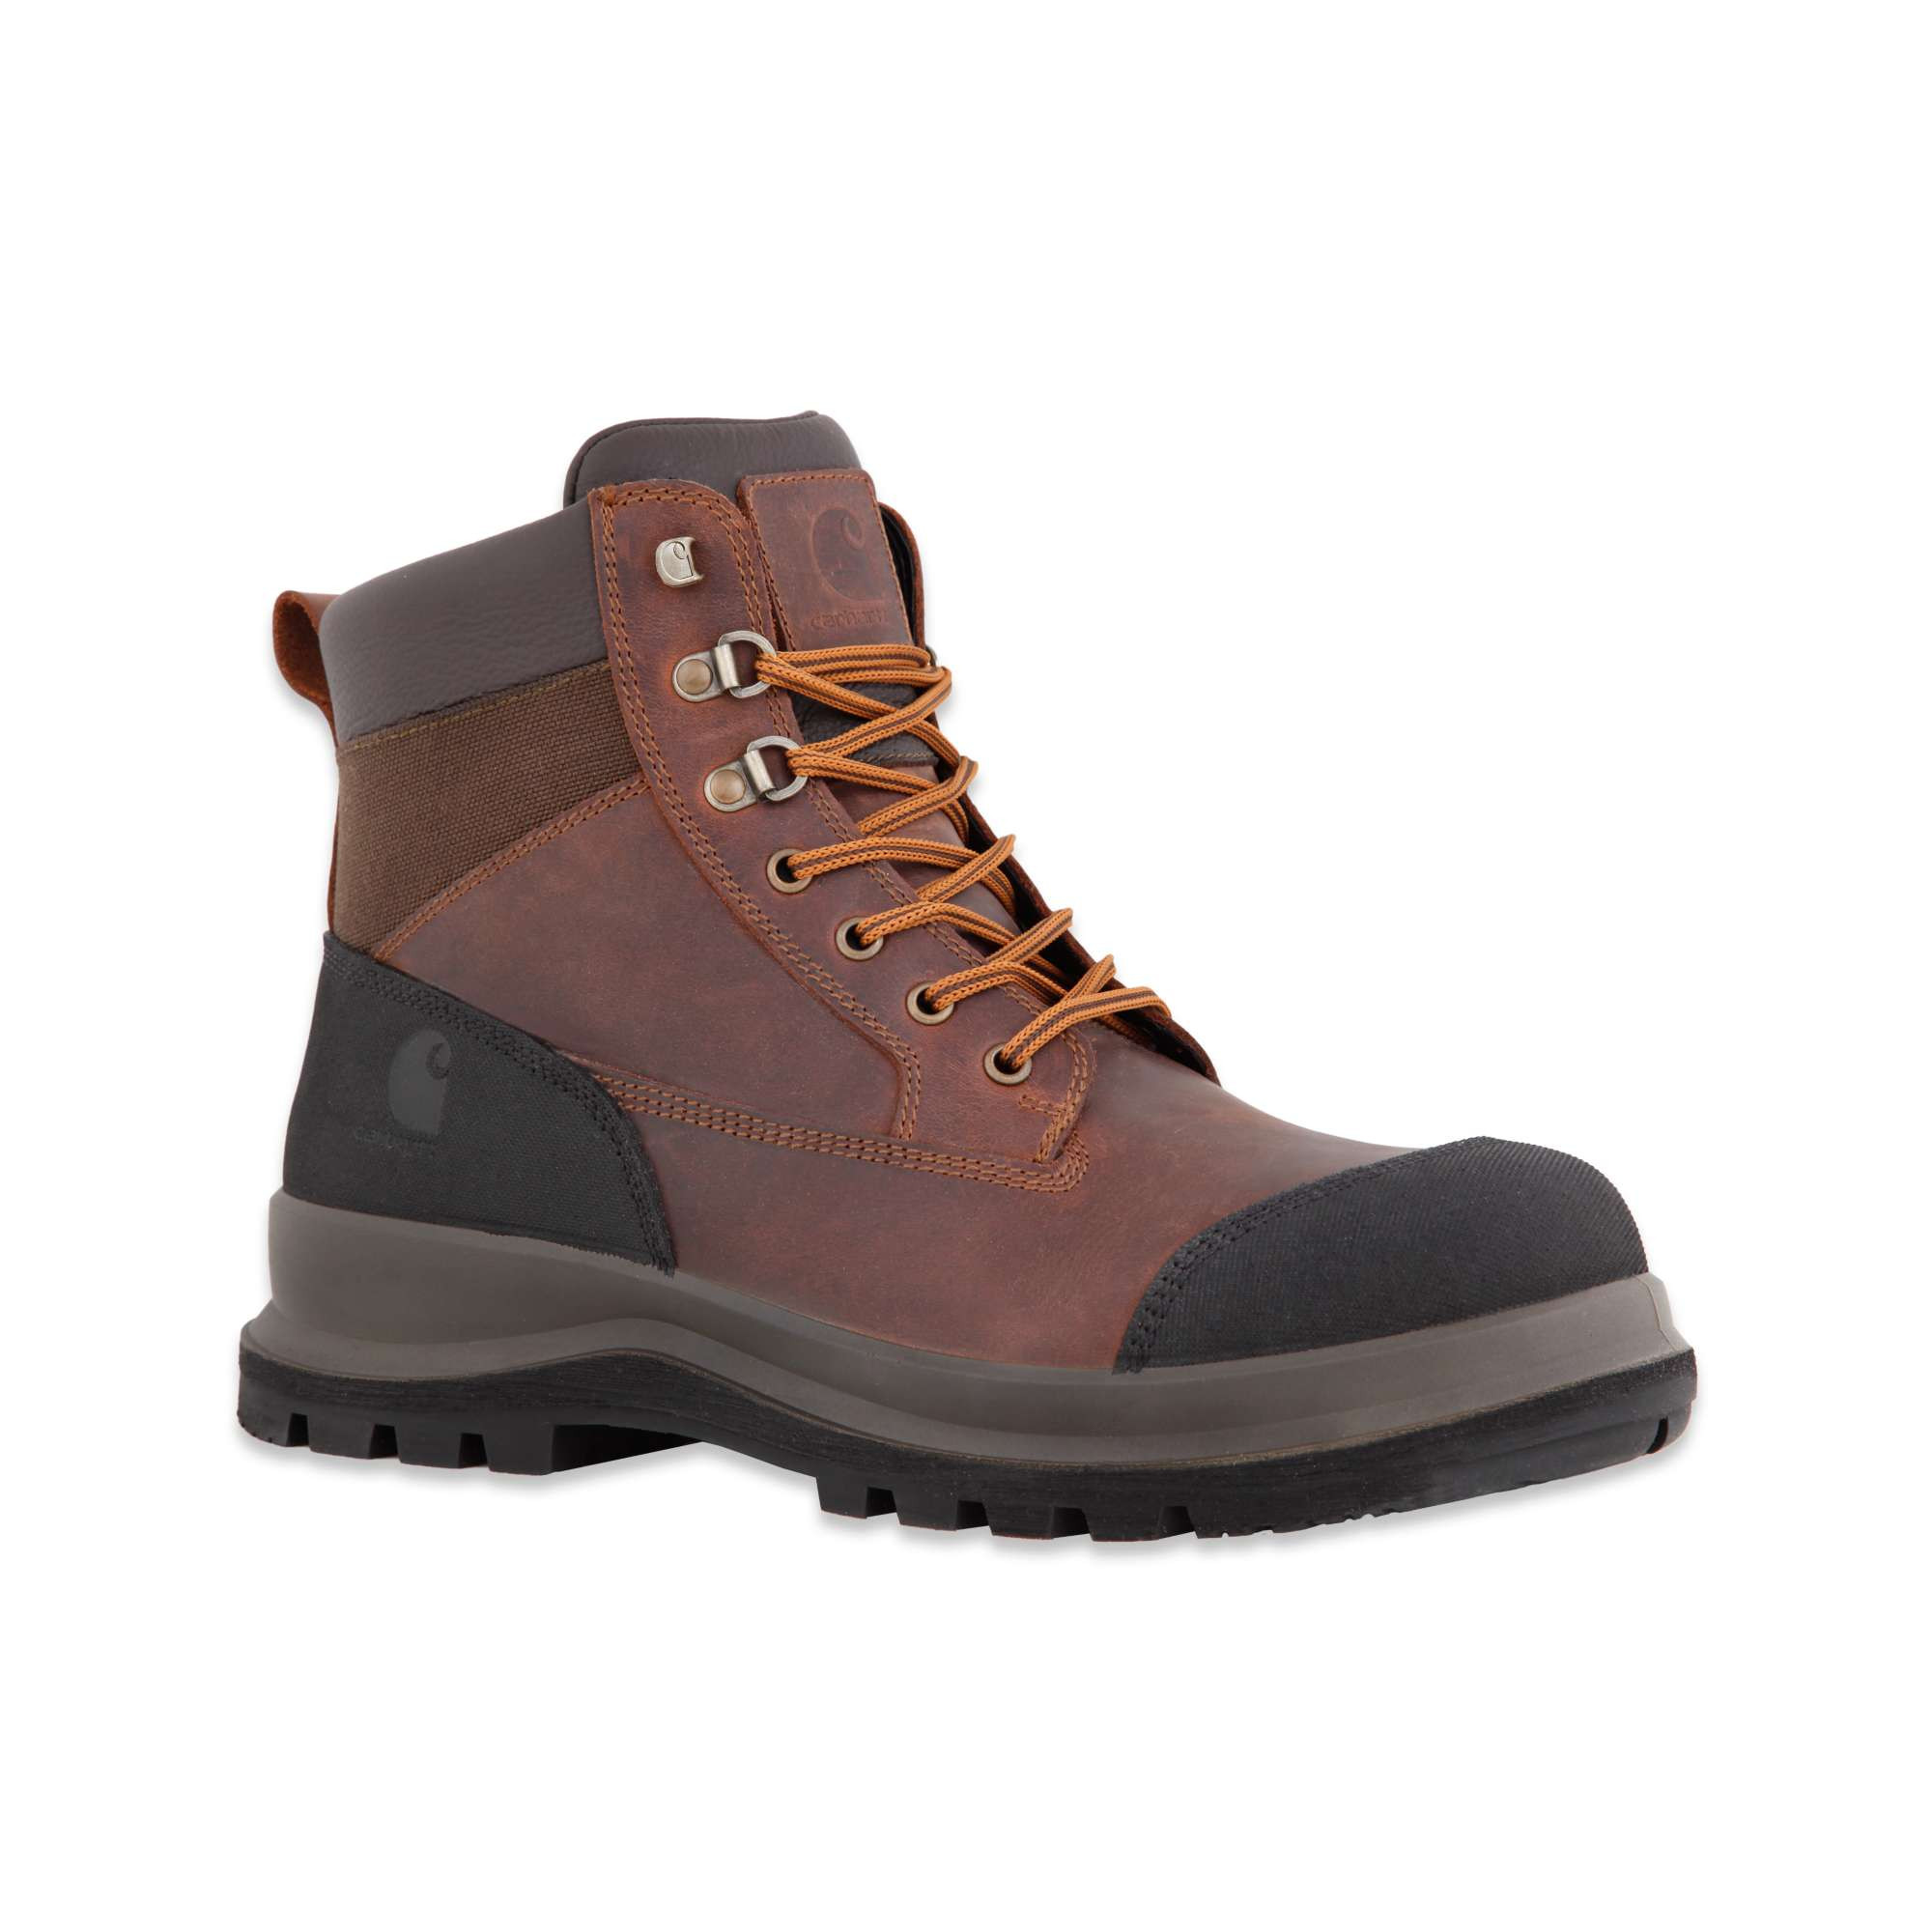 "Ботинки Carhartt Detroit 6"" S3 Work Boot - F702903 (Dark Brown, 42)"